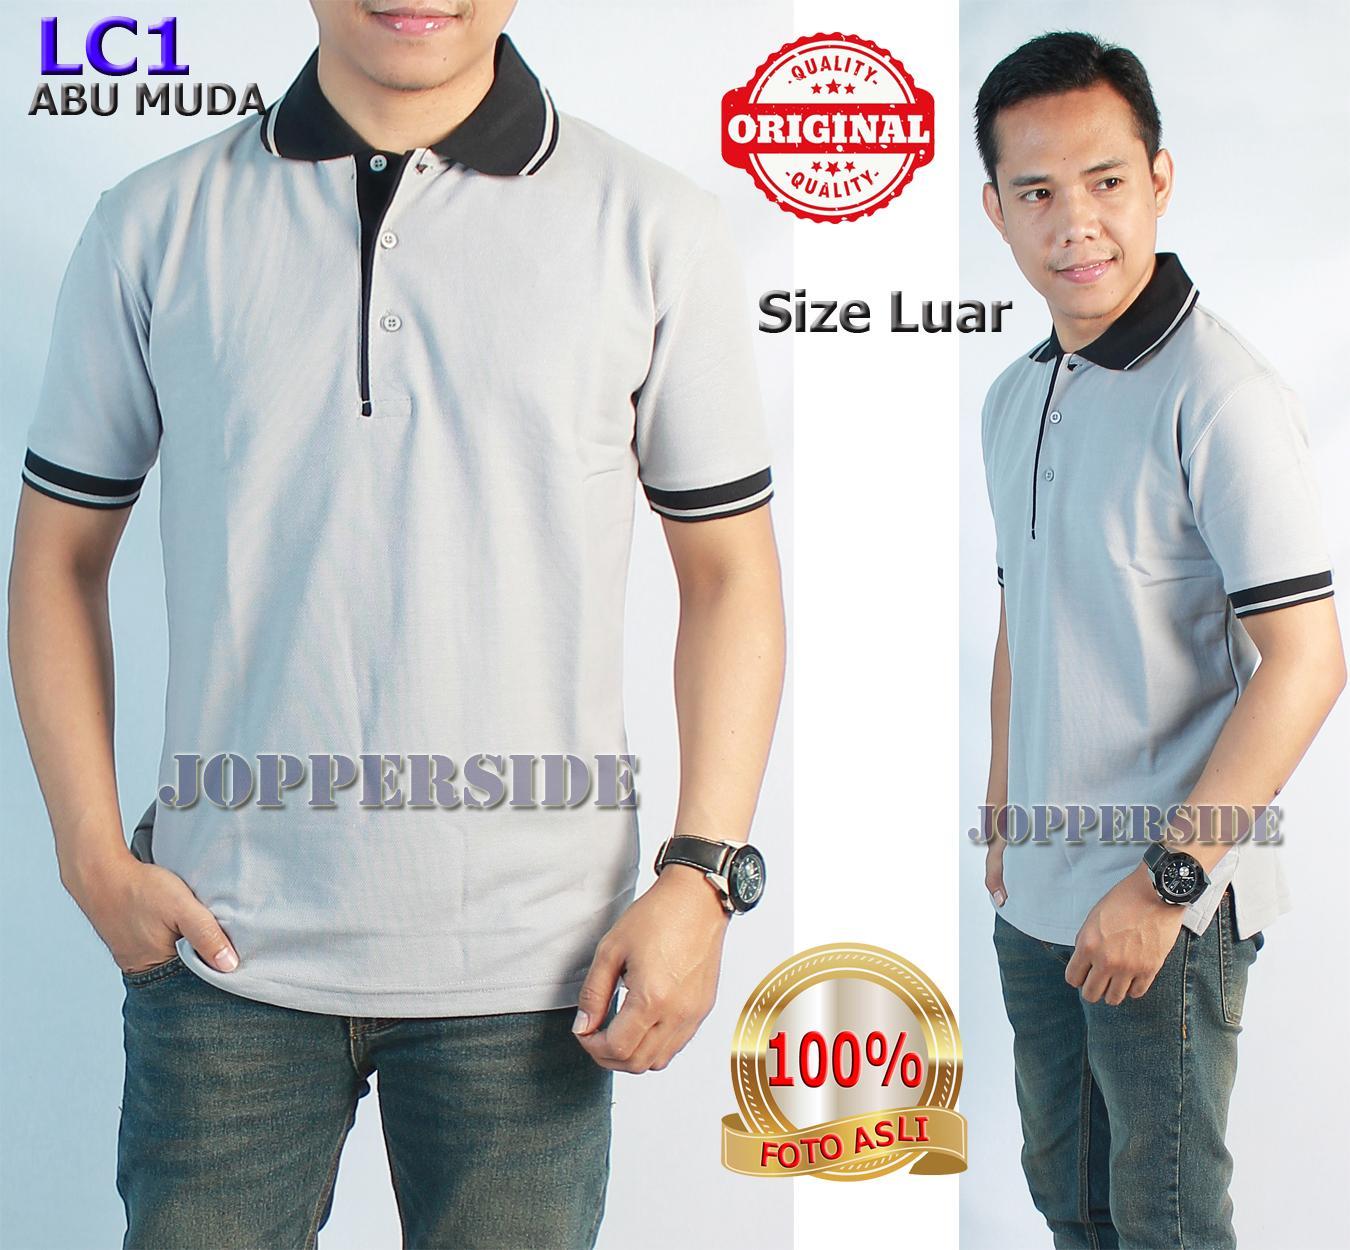 Jual Kaos Polo Anak Abu Muda Misty Cotton Pique Harga Rp 39000 Polos Black Jopperside Shirt Original Wangki Pria Hitam Lc1